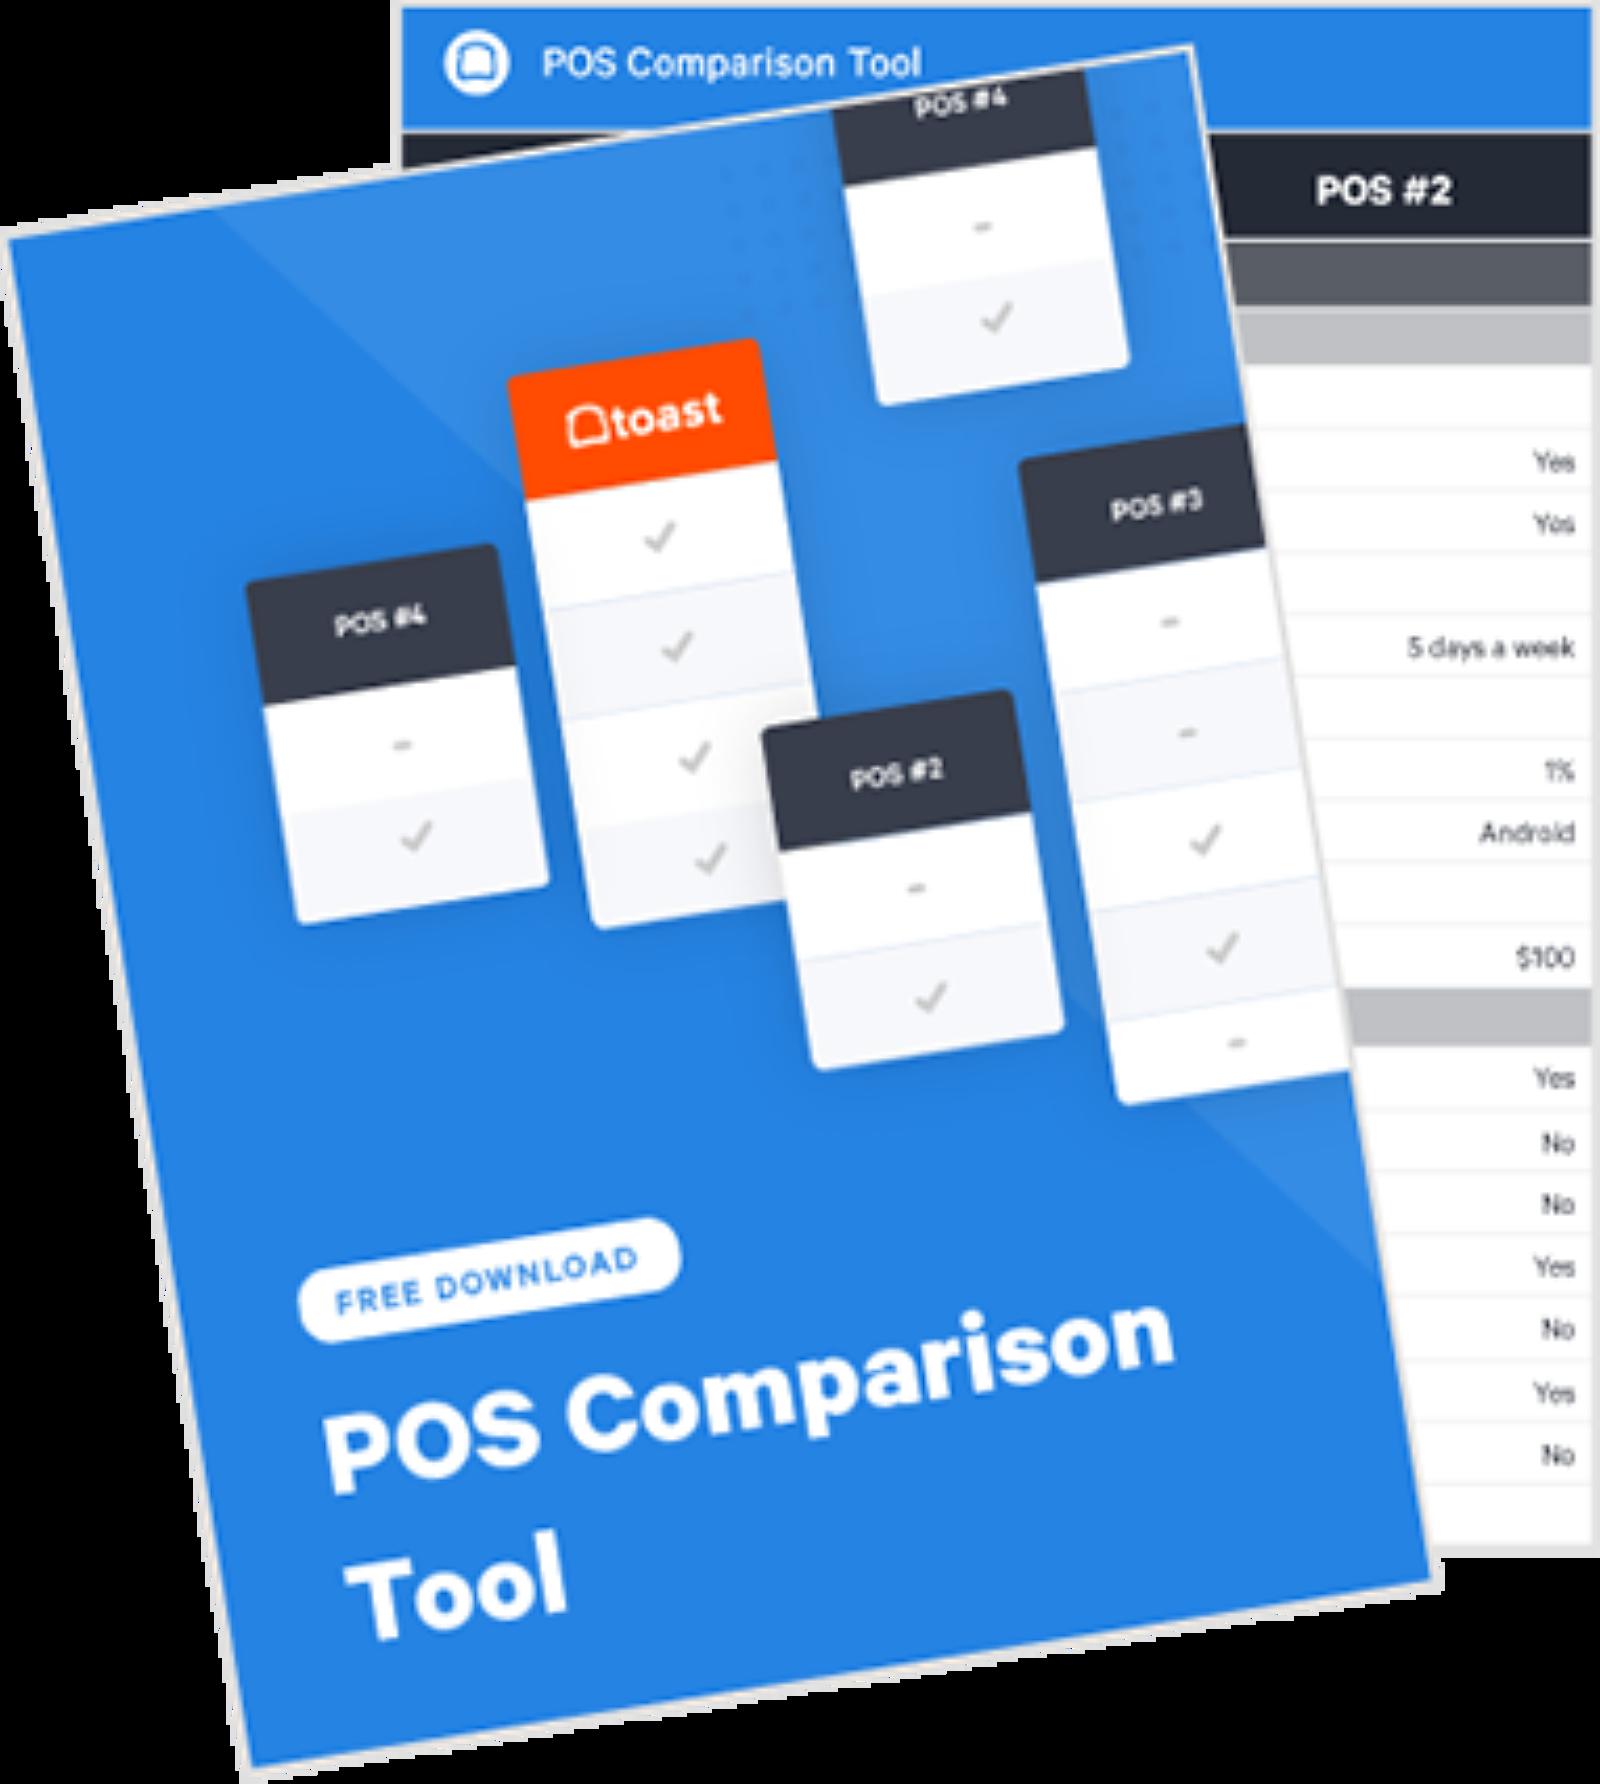 POS comparison tool thumbnail